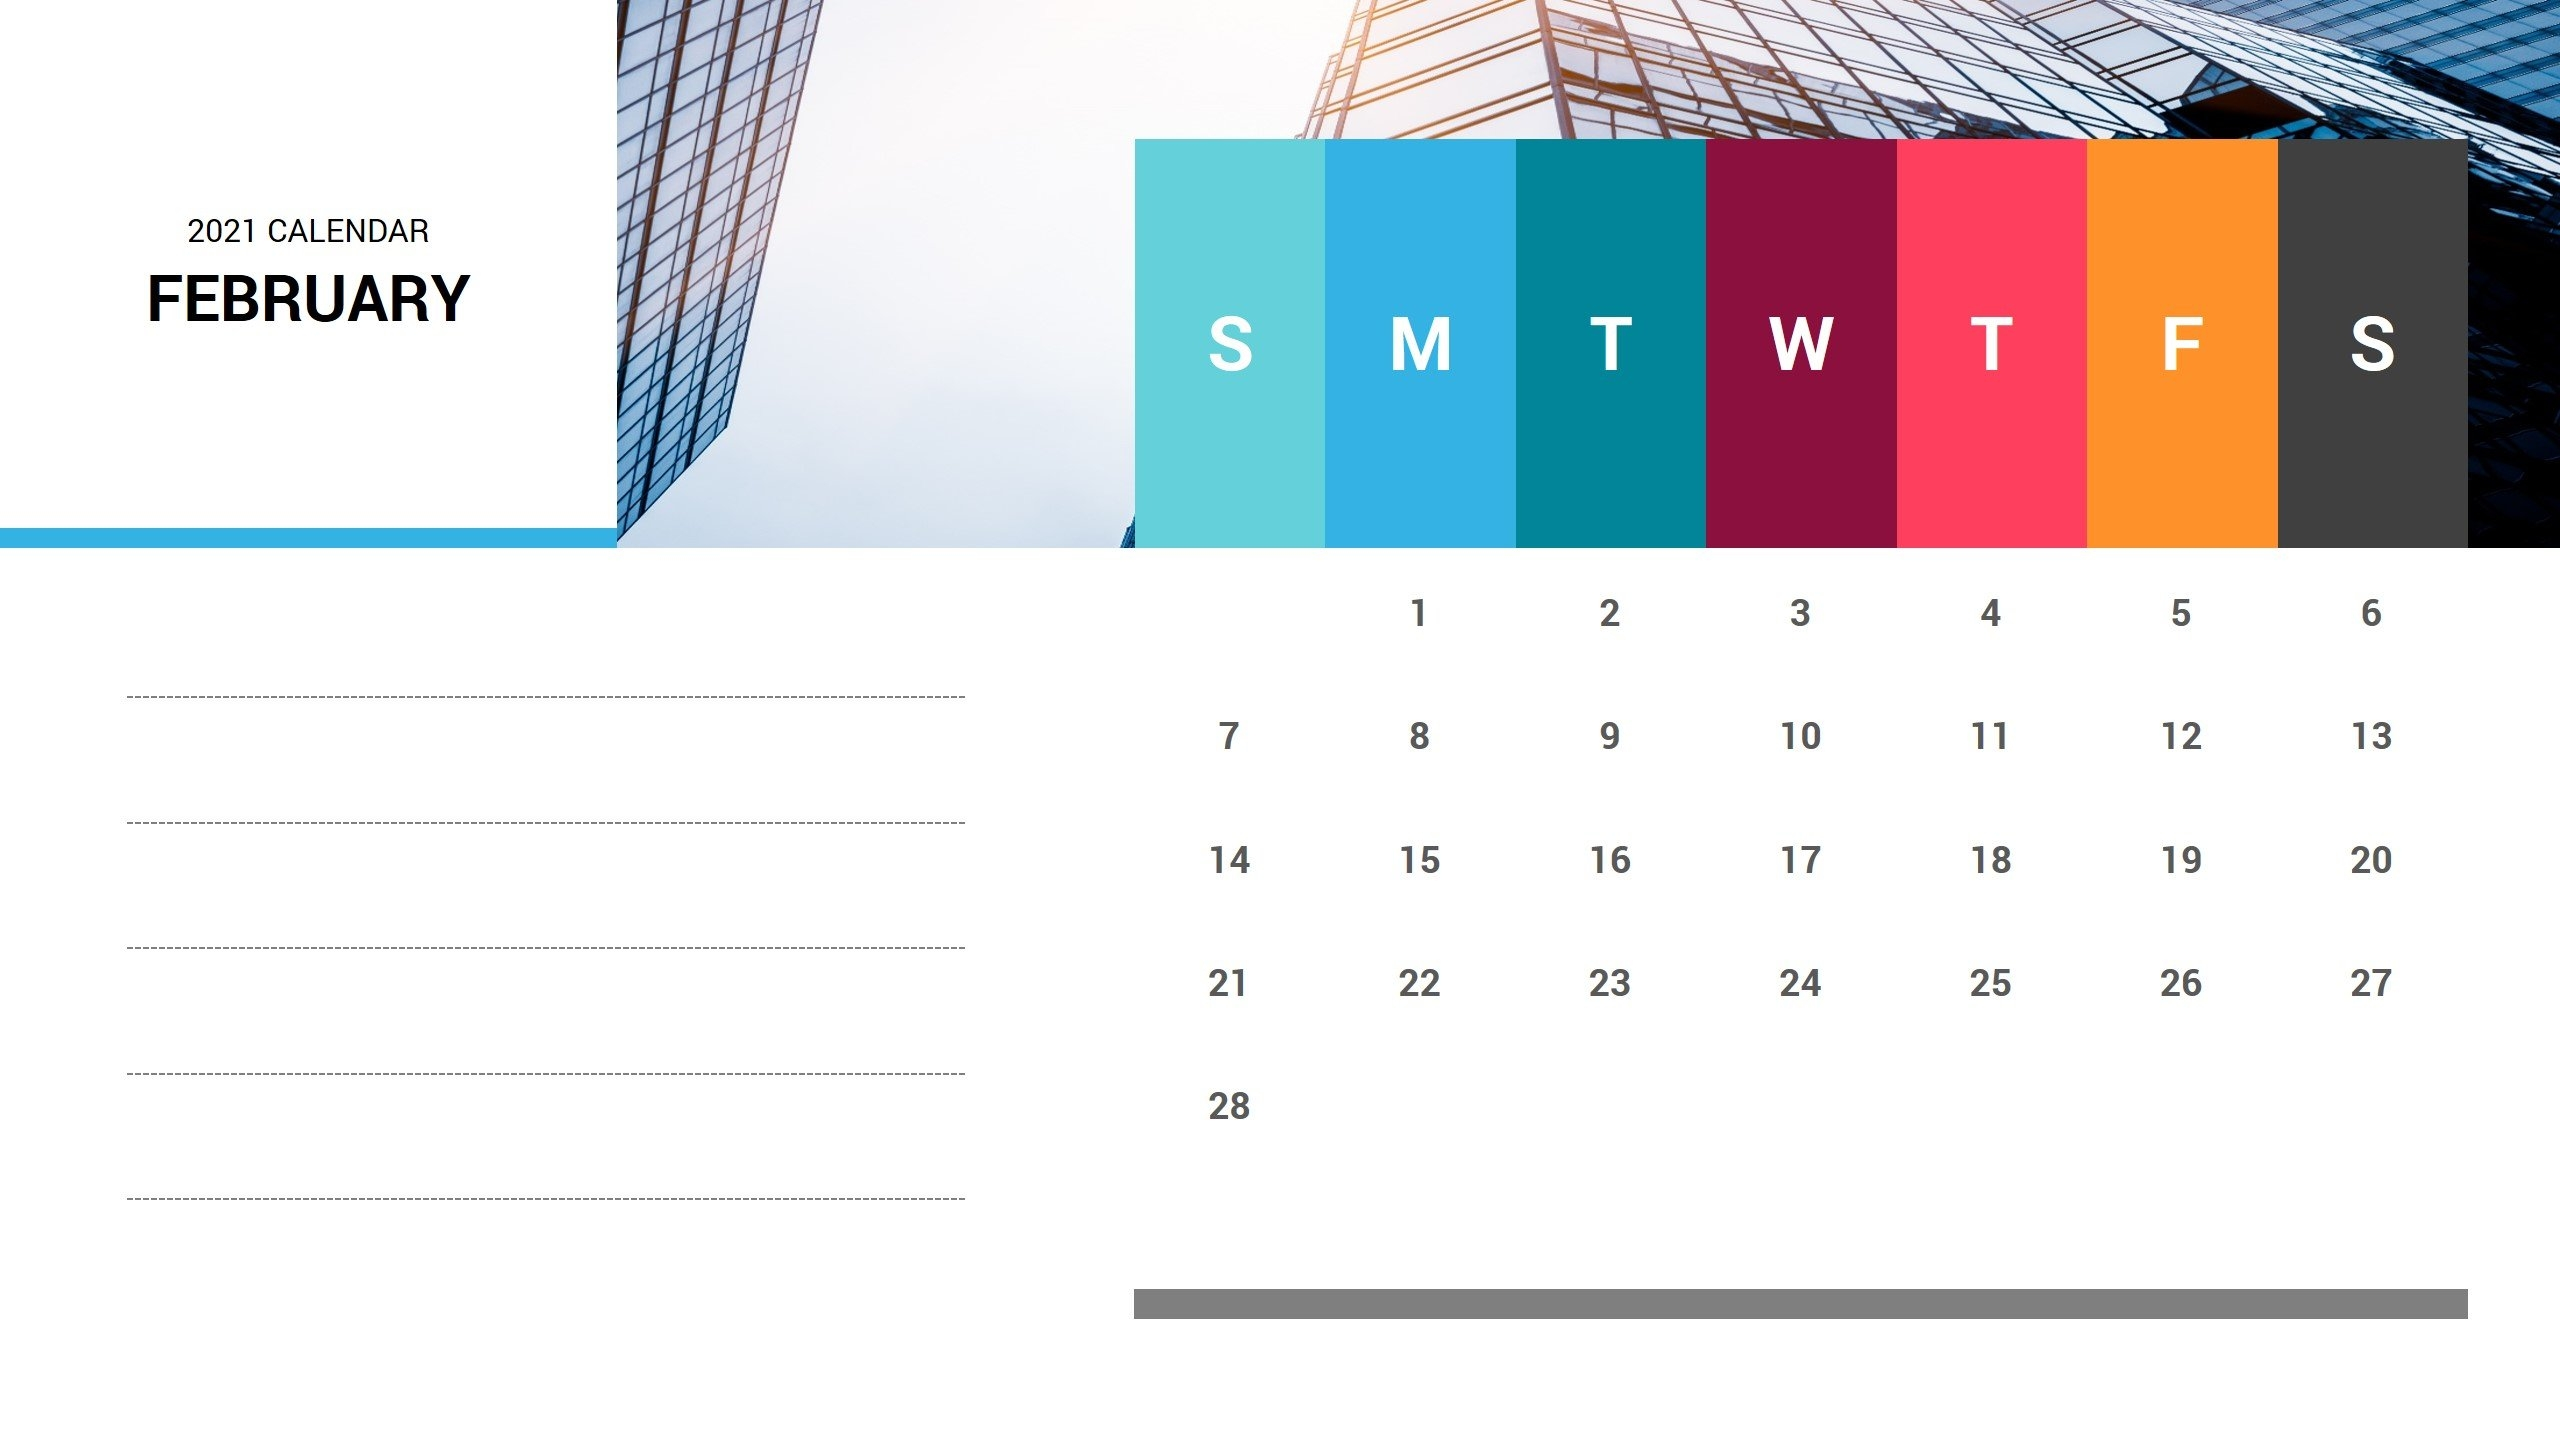 February 2021 Calendar Powerpoint Template | Ciloart with regard to Ppt Calendar Template 2021 Photo